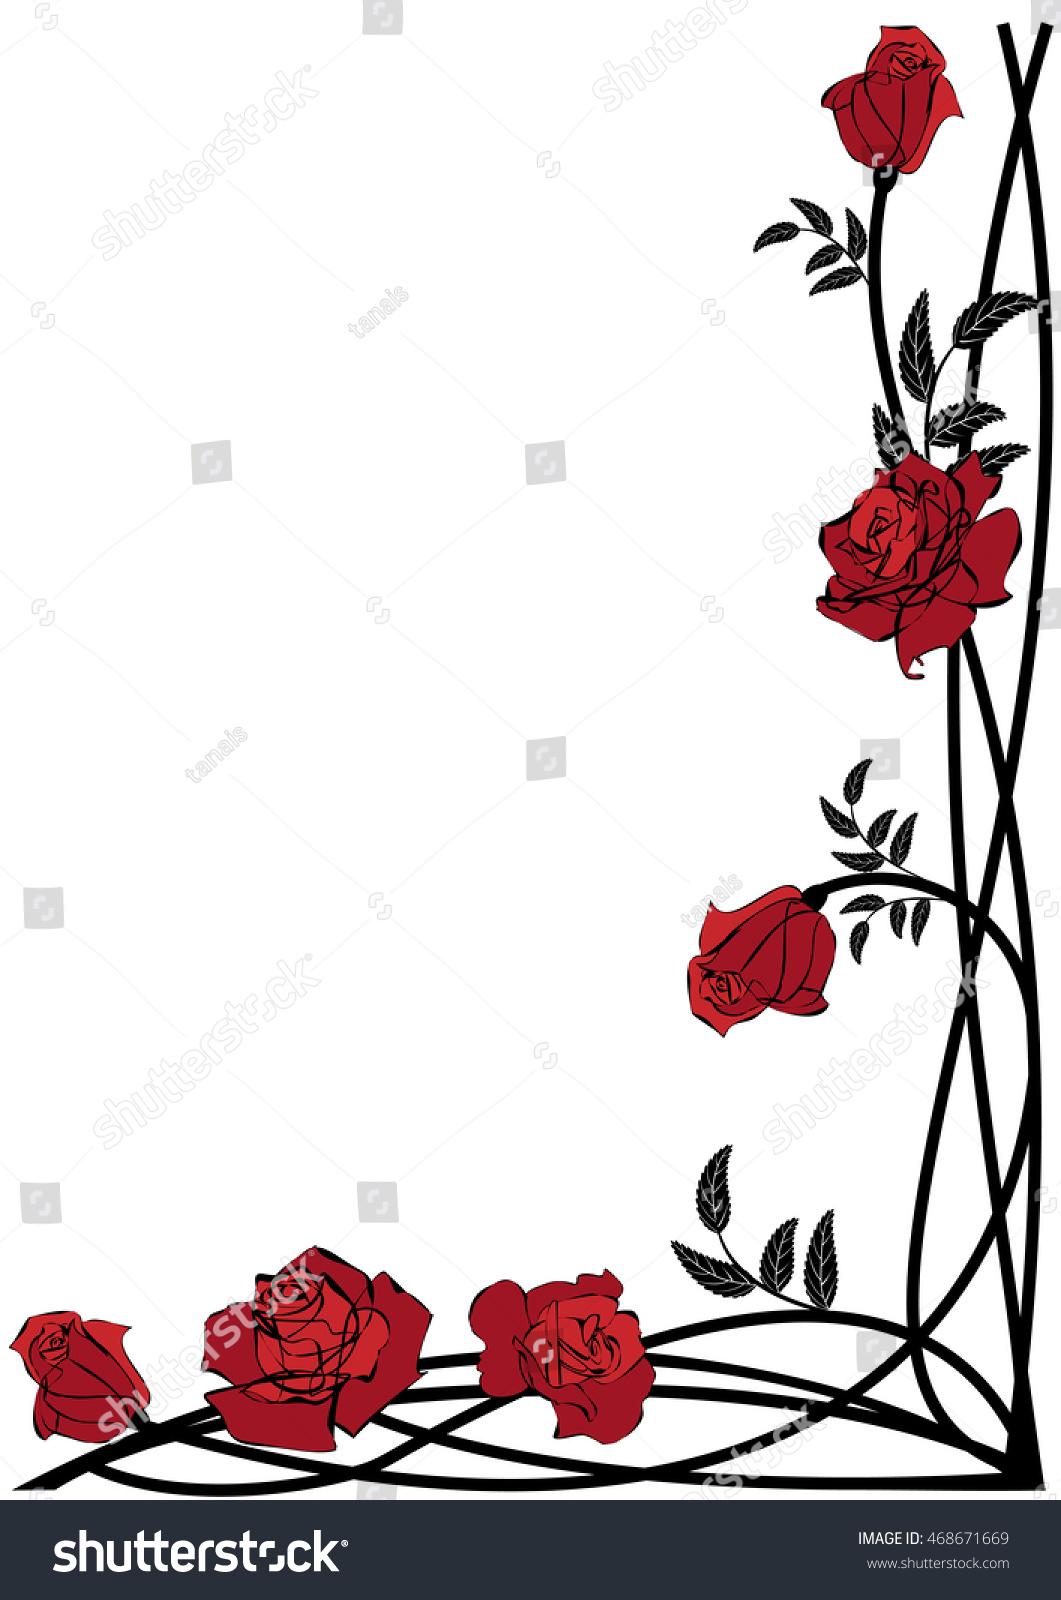 Vector Floral Border With Roses For Corner Design